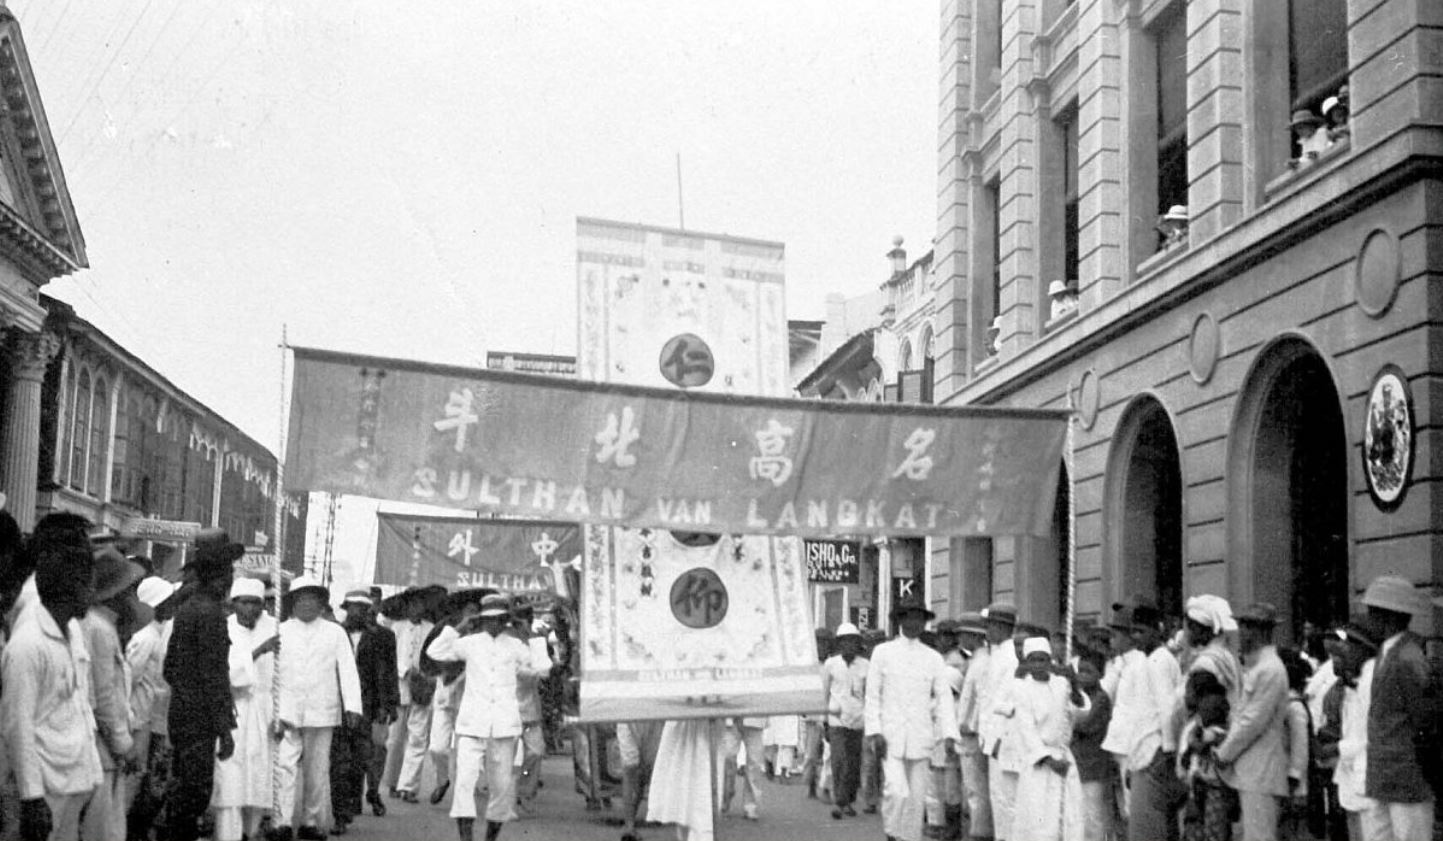 Sebuah spanduk Sultan Langkat tsb ternyata pujian: Tjong A Fie terkenal di penjuru dunia dan begitu dihormati. Pujian tsb tercermin di potret pertama: orang semua bangsa mengantarkan jenazahnya, ada yang bertopi, berpeci, juga berserban